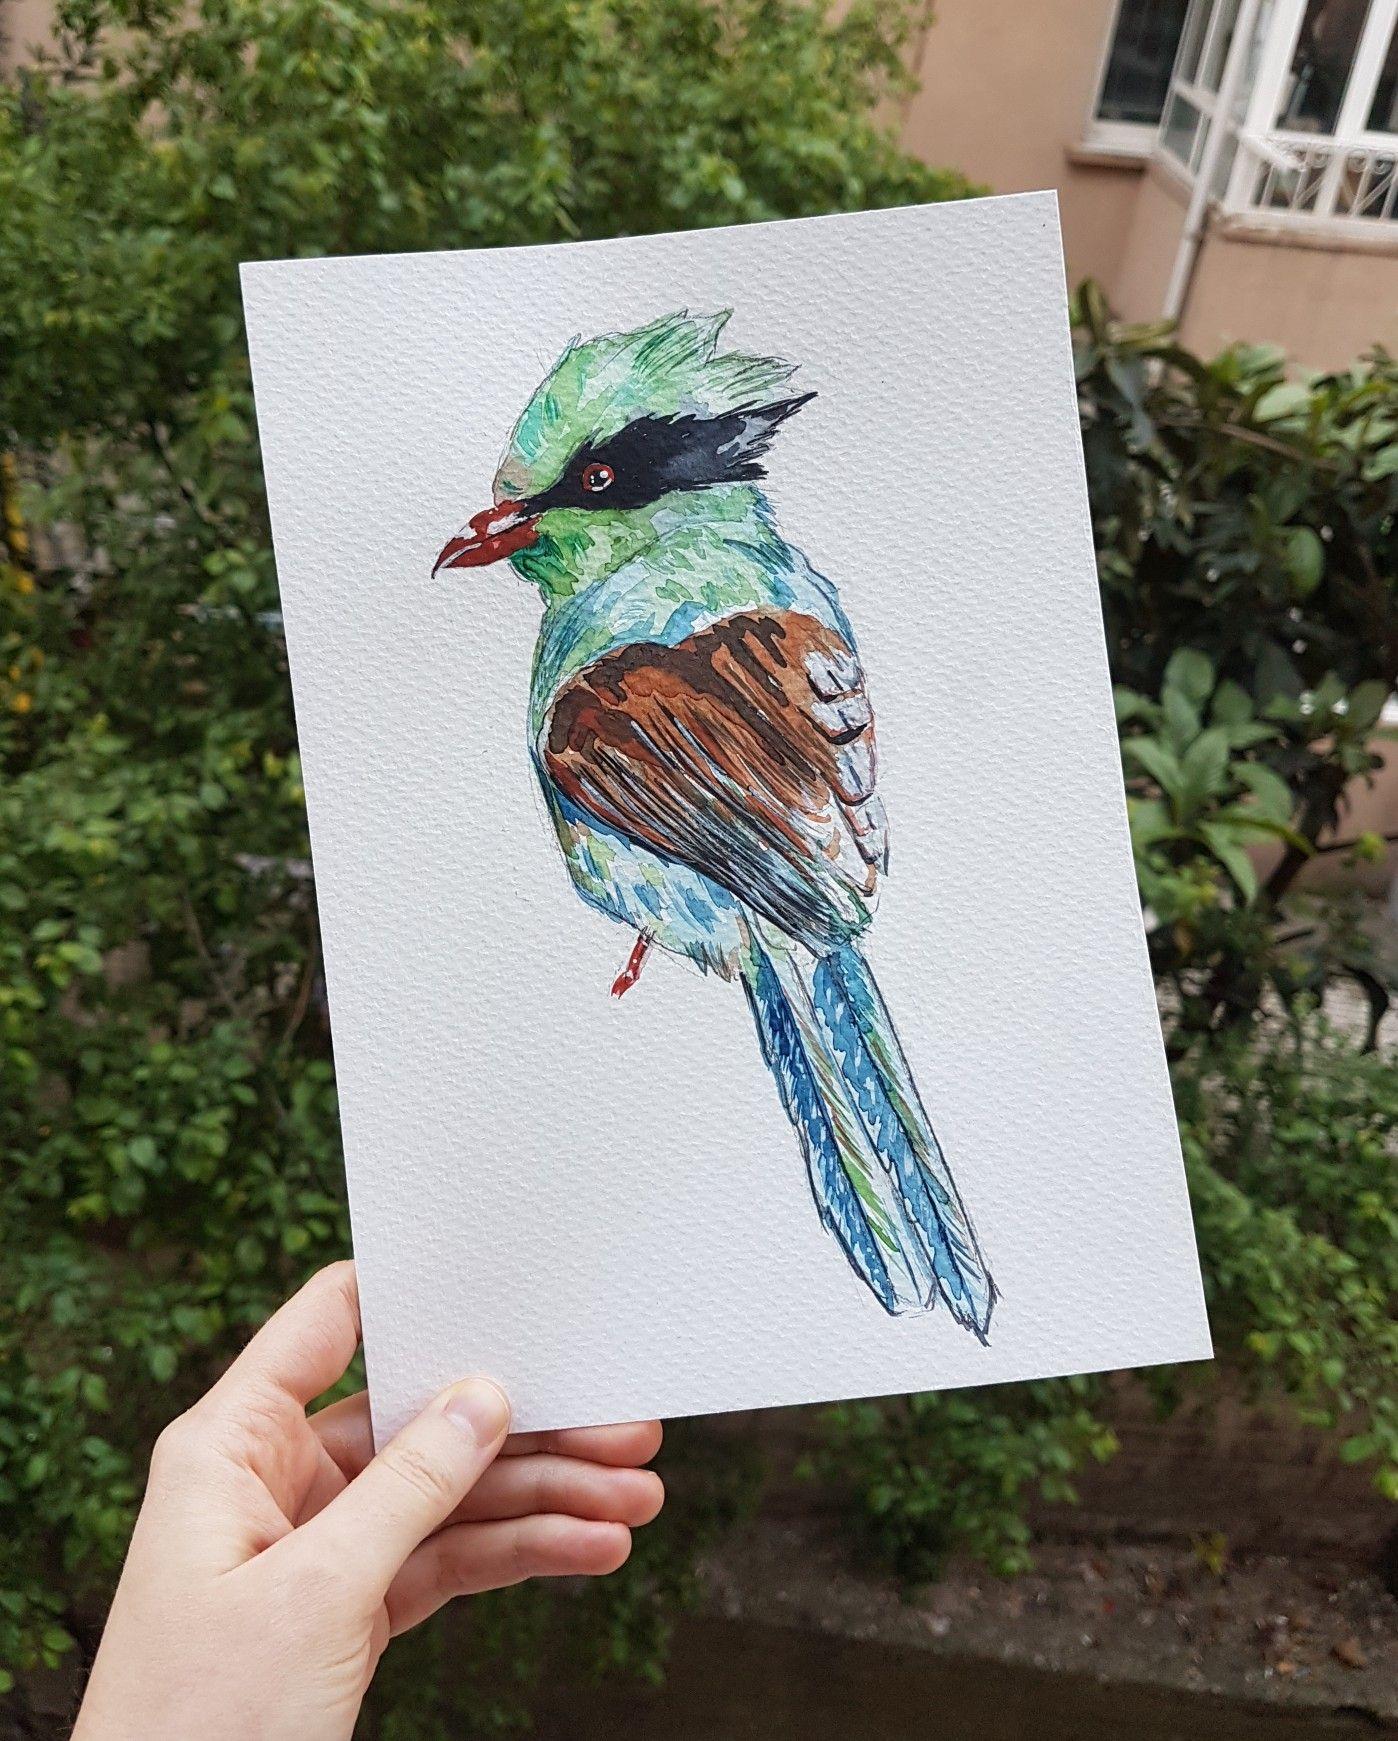 #watercolor #watercolour #watercolorpainting #suluboya #акварель  #art #aquarelle #gouachepainting #watercolorillustration #